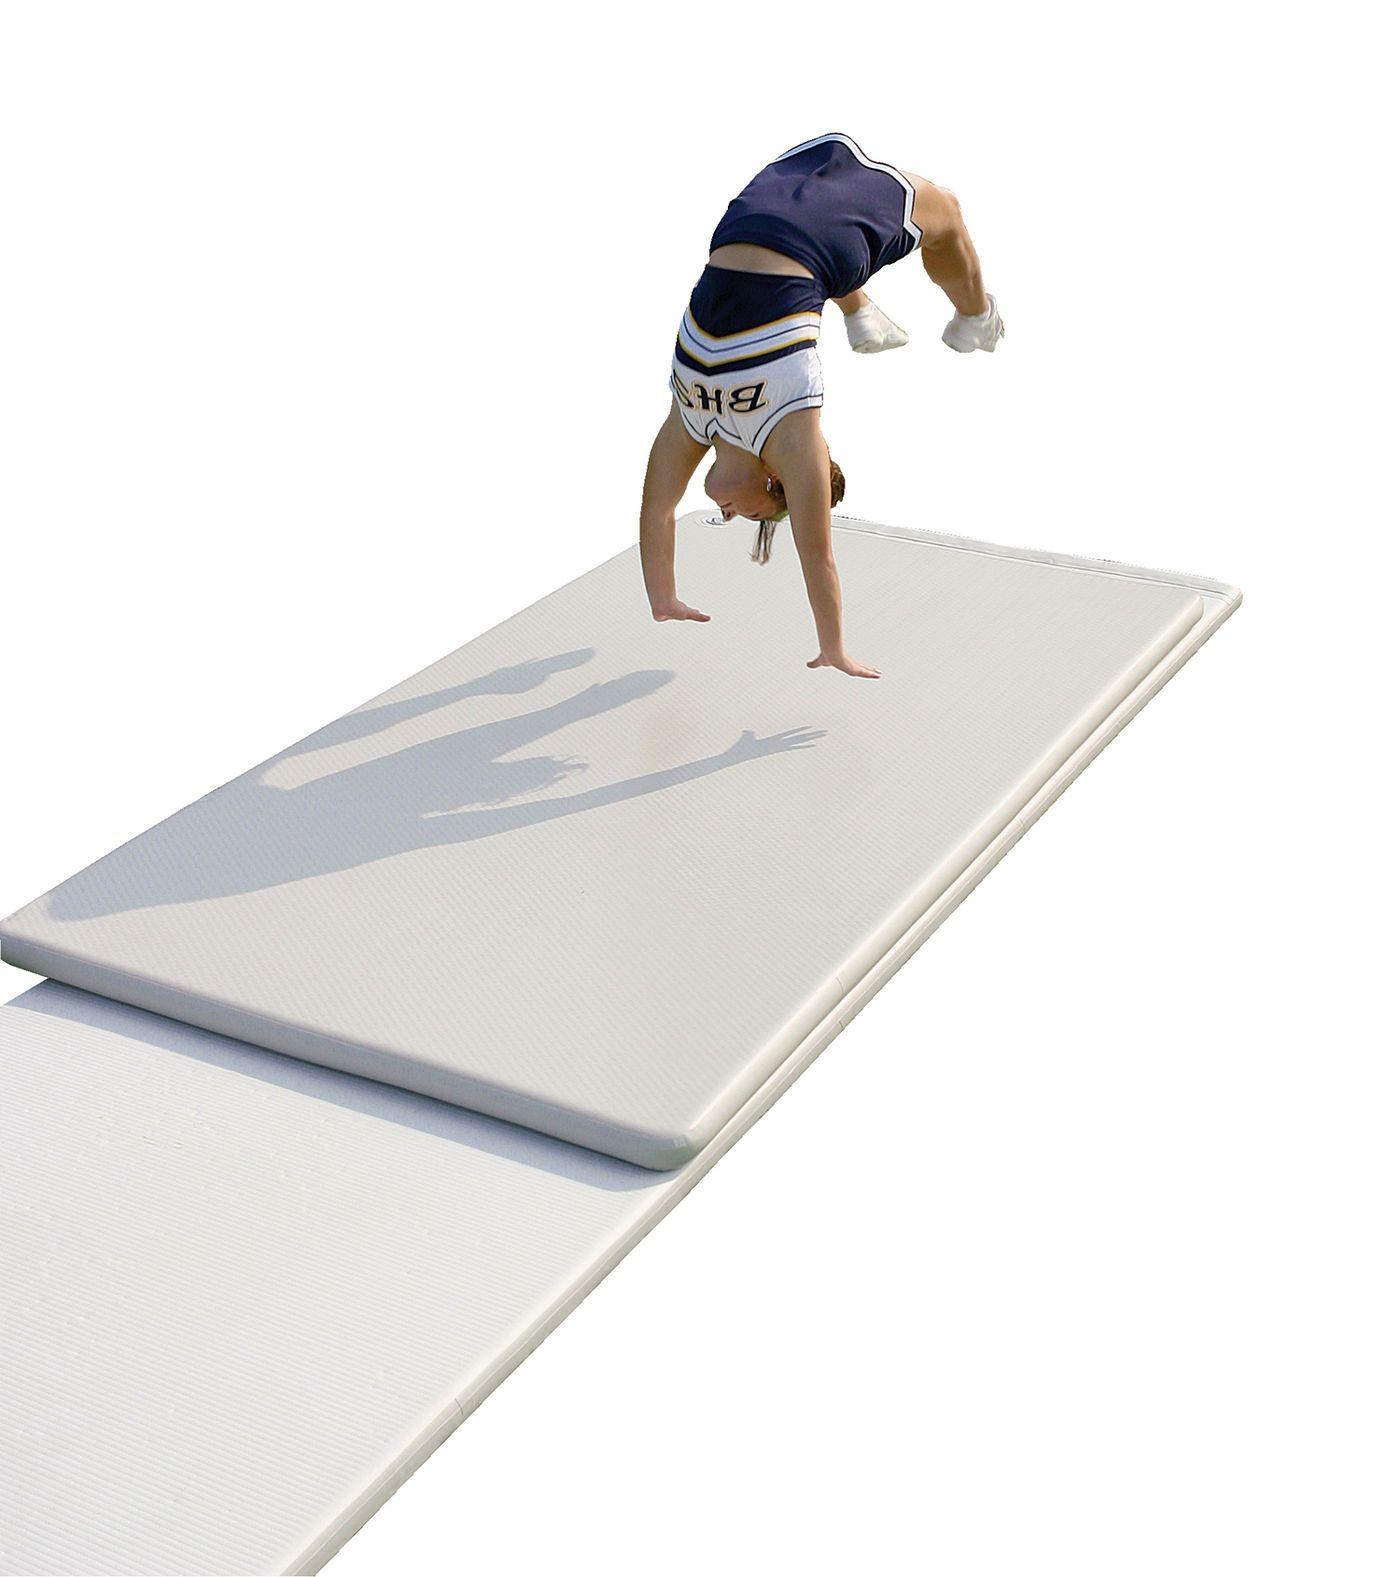 my equipment wear gymnastics collections bar used studio dance mats floor home gymnastic